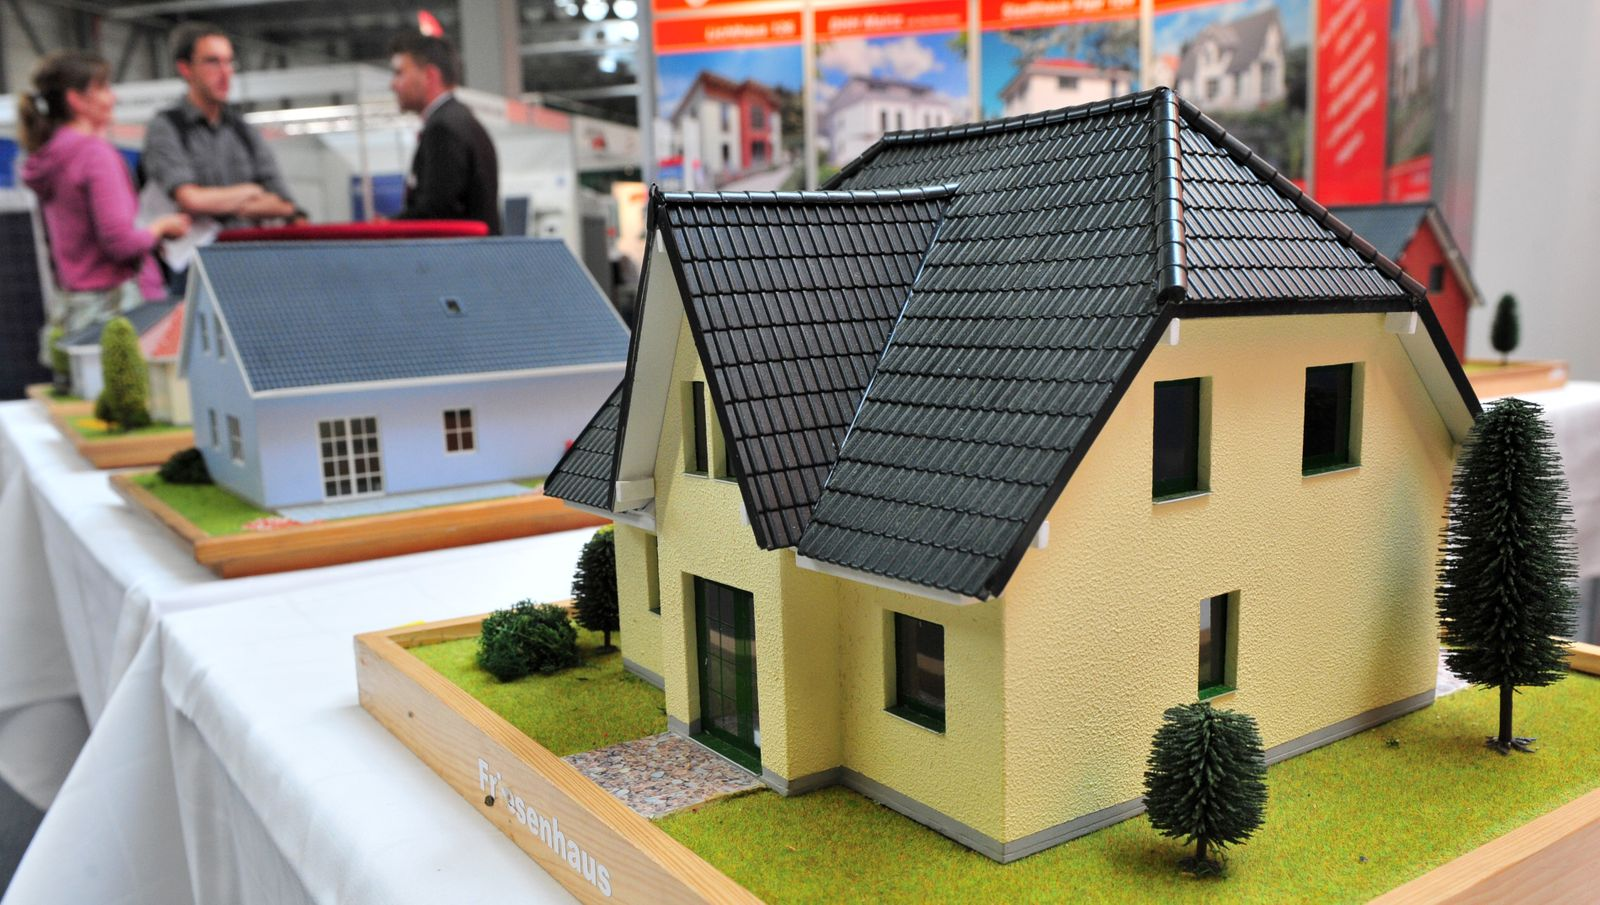 Immobilie / Hausbau / Immobilienfinanzierung